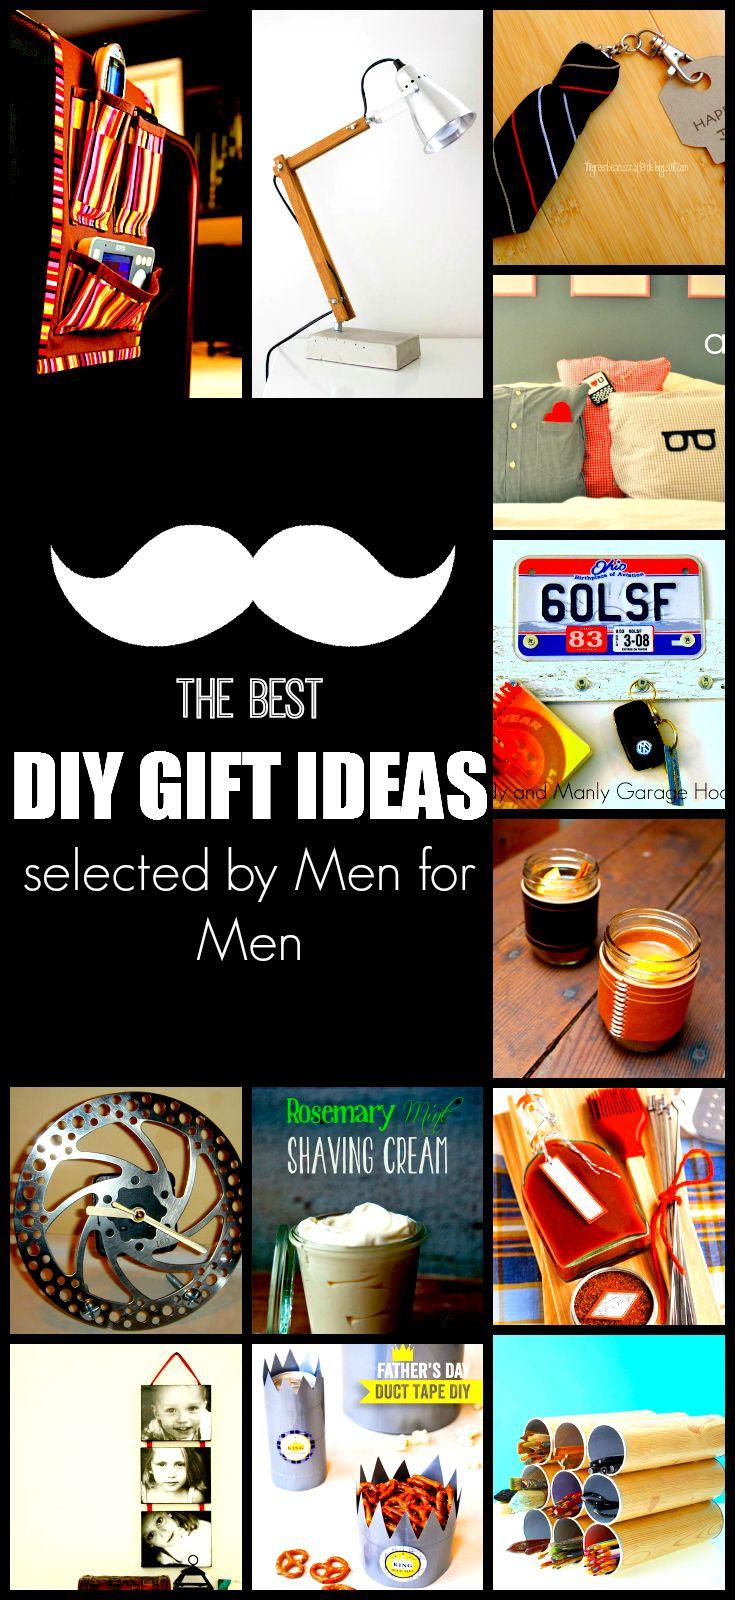 The-Best-DIY-GIFT-IDEAS-selected-by-Men-for-Men.jpg 735×1,600 pixels